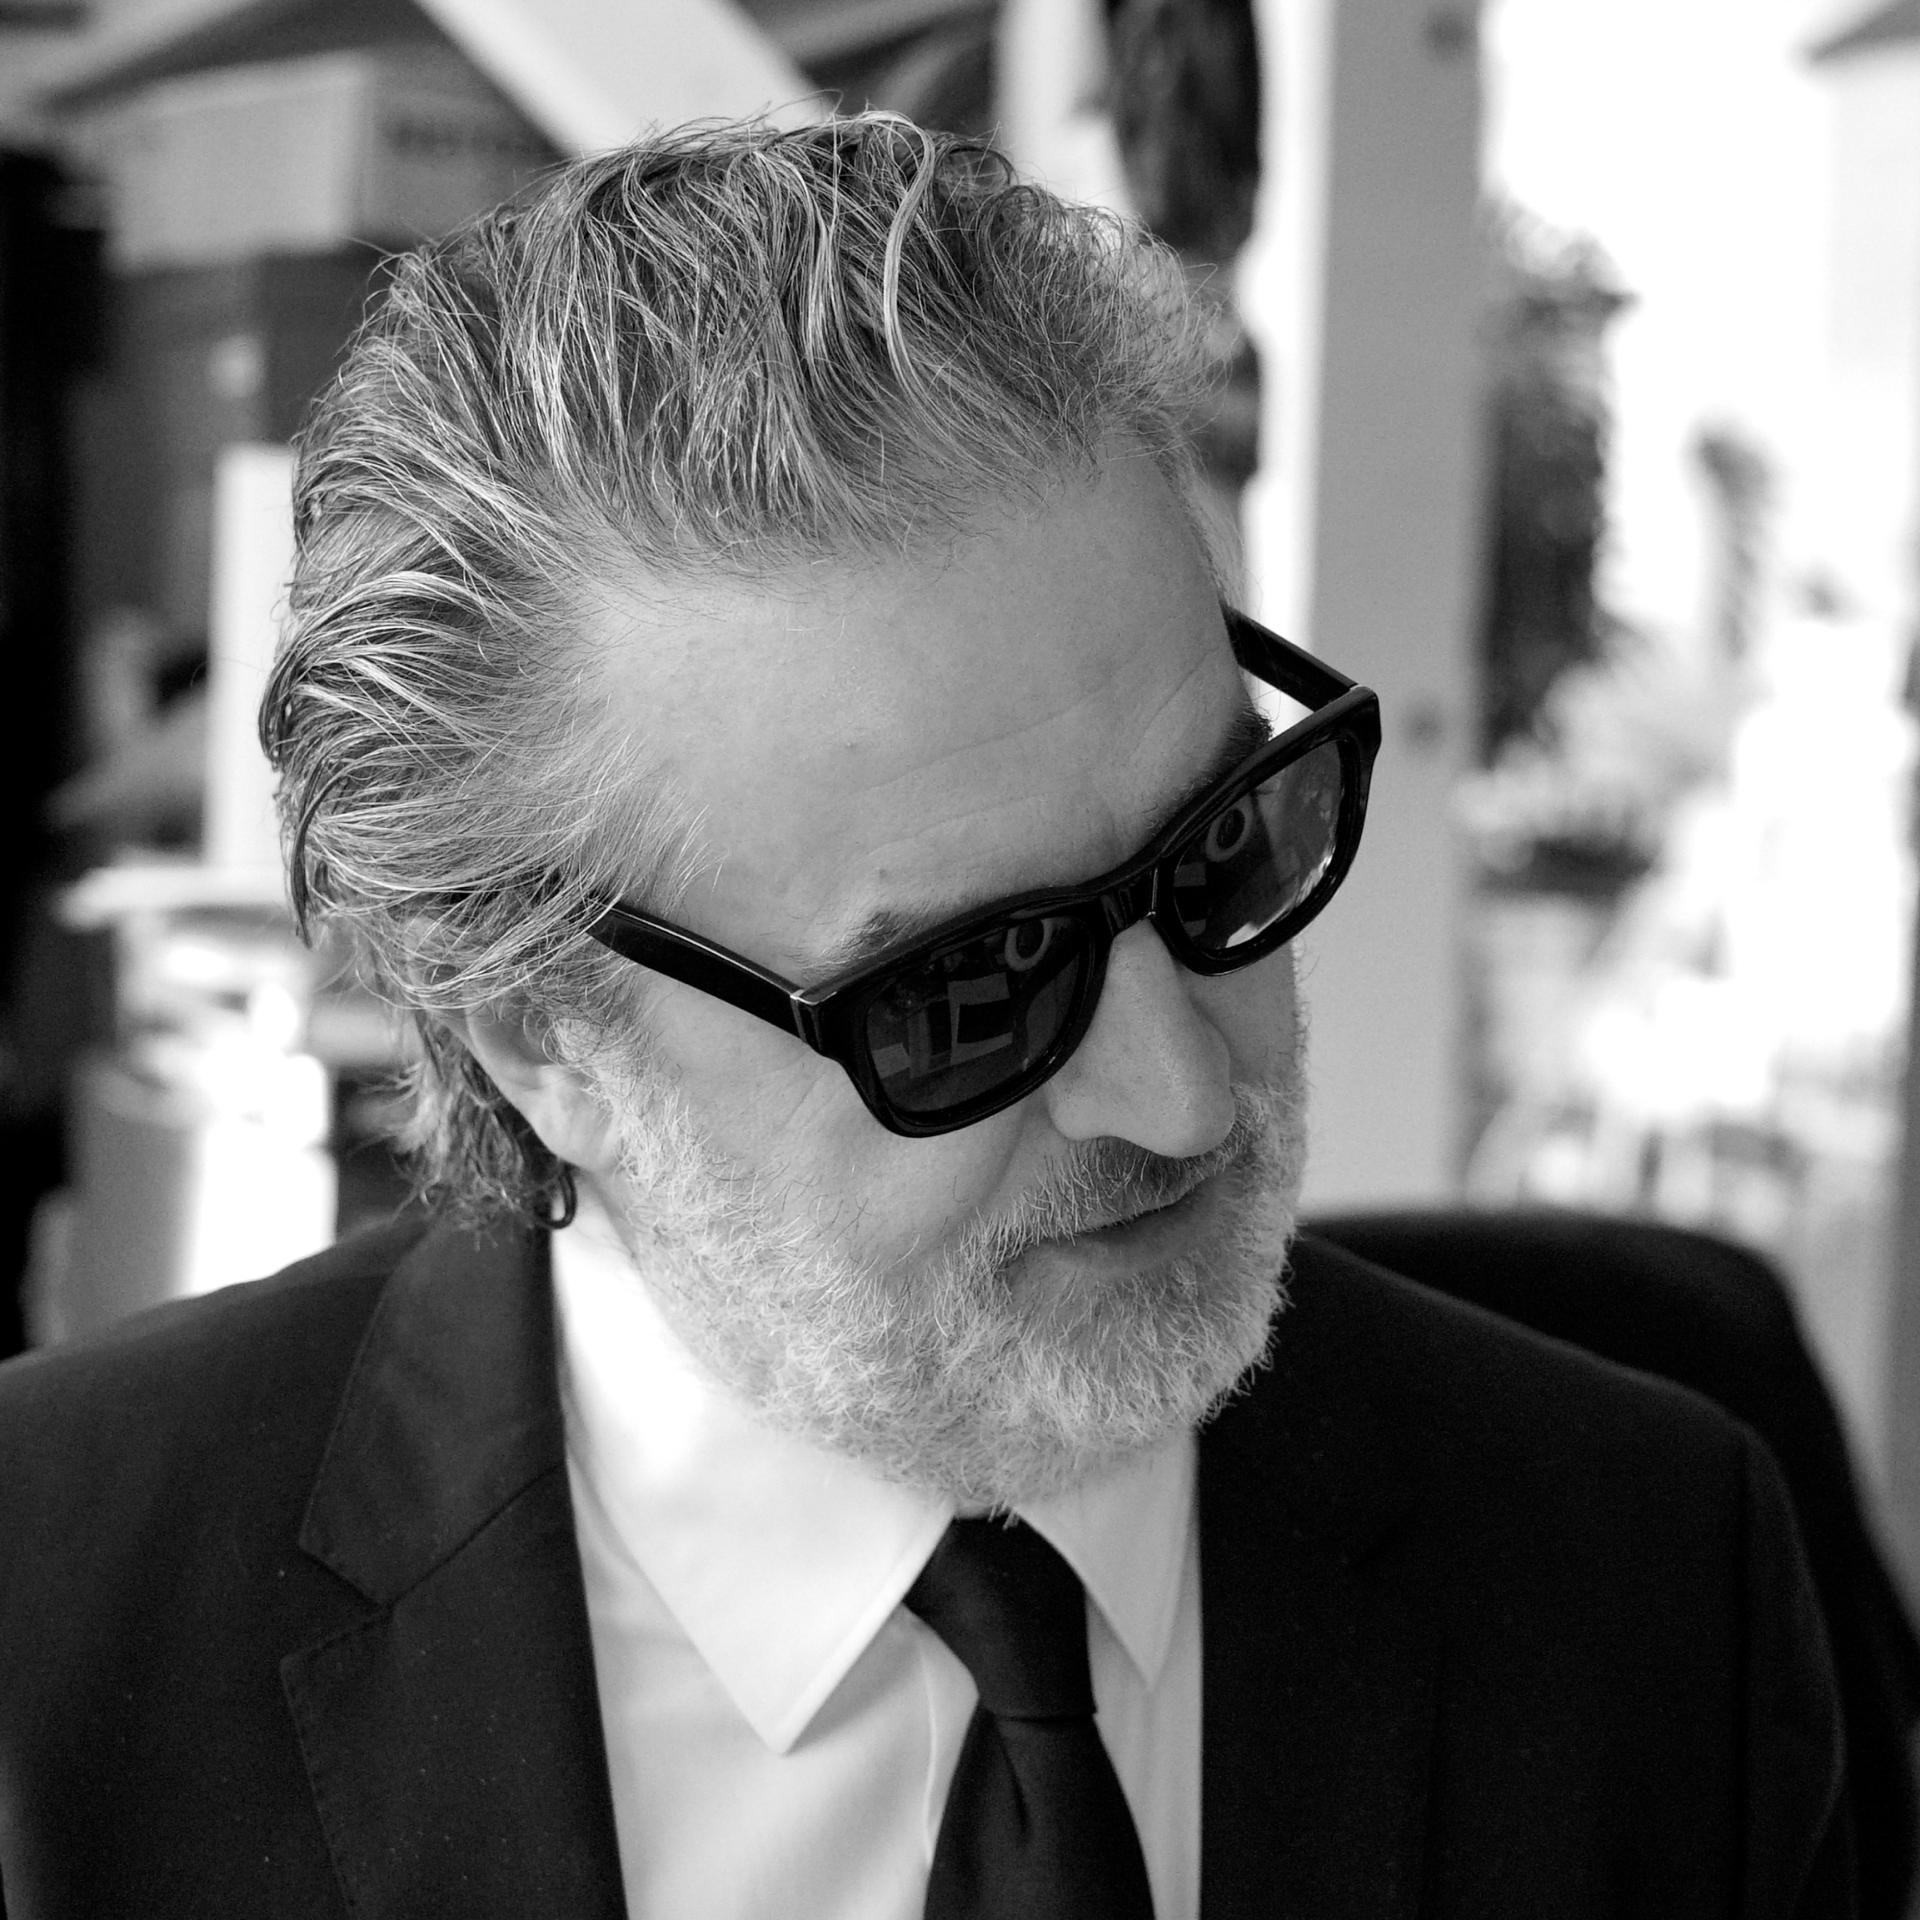 Bruno Martelli